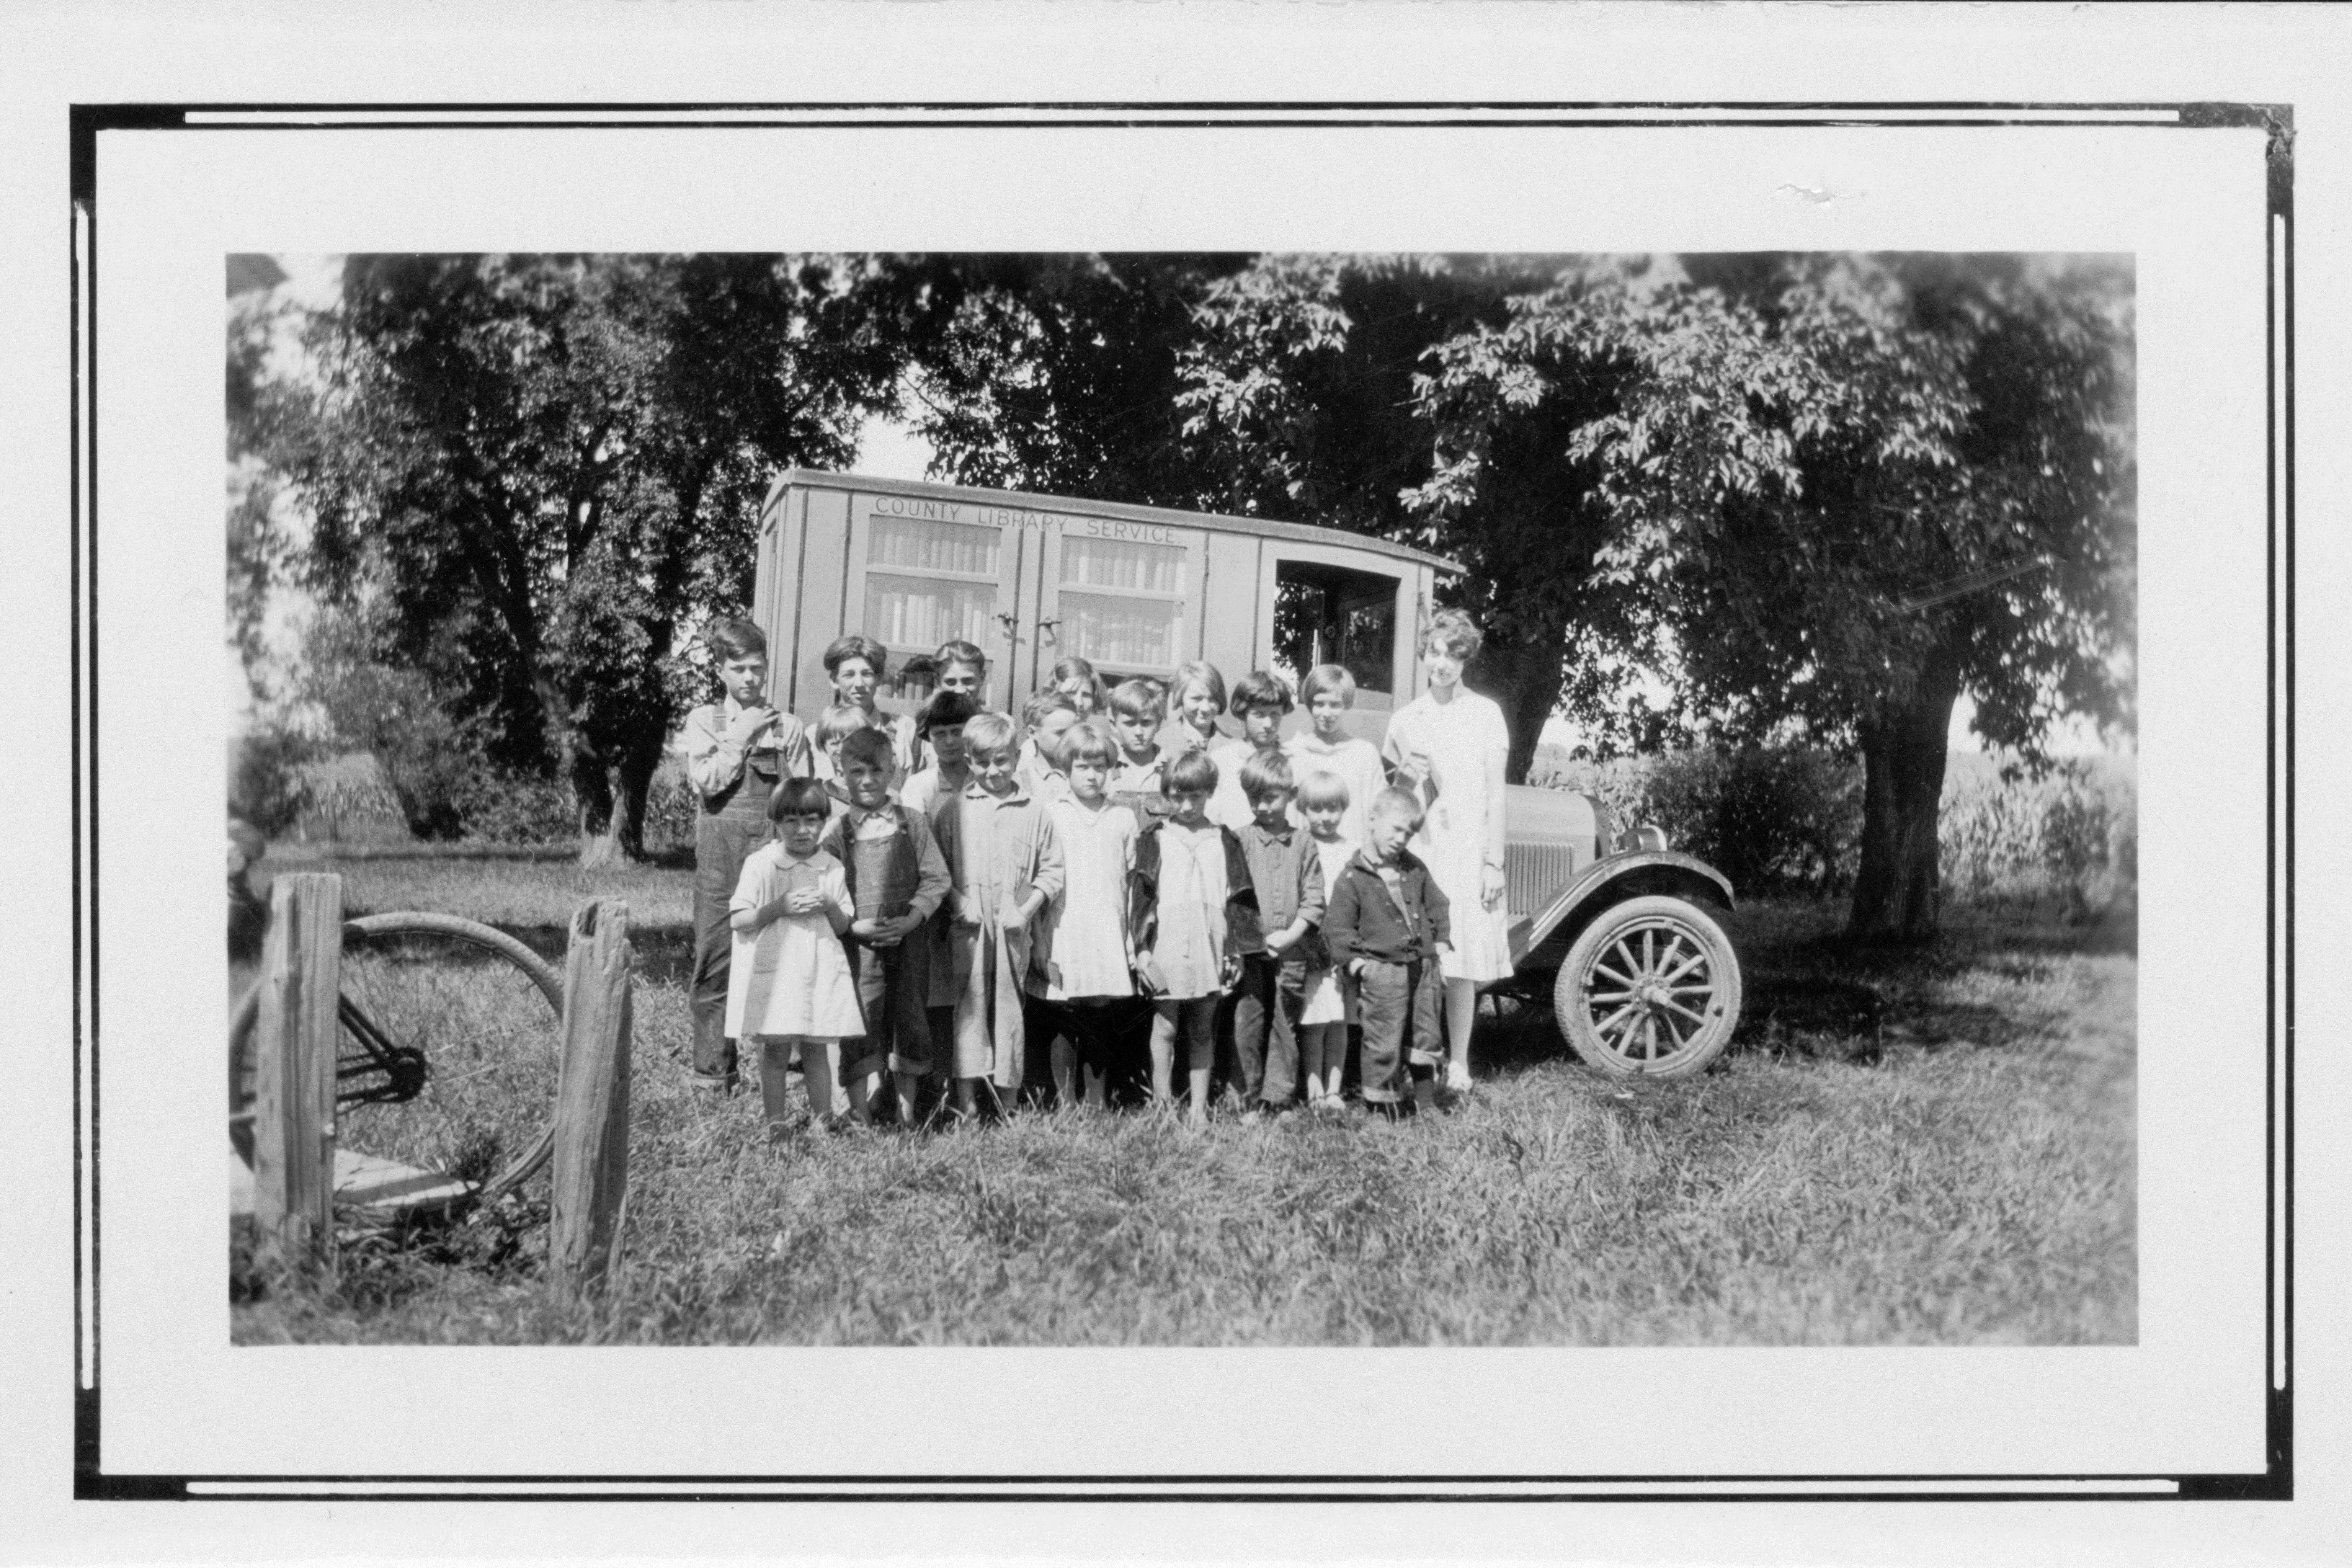 [Hardin Co. IA] School District No. 2. Teacher - Miss Helen Holbrook - ca. 1926